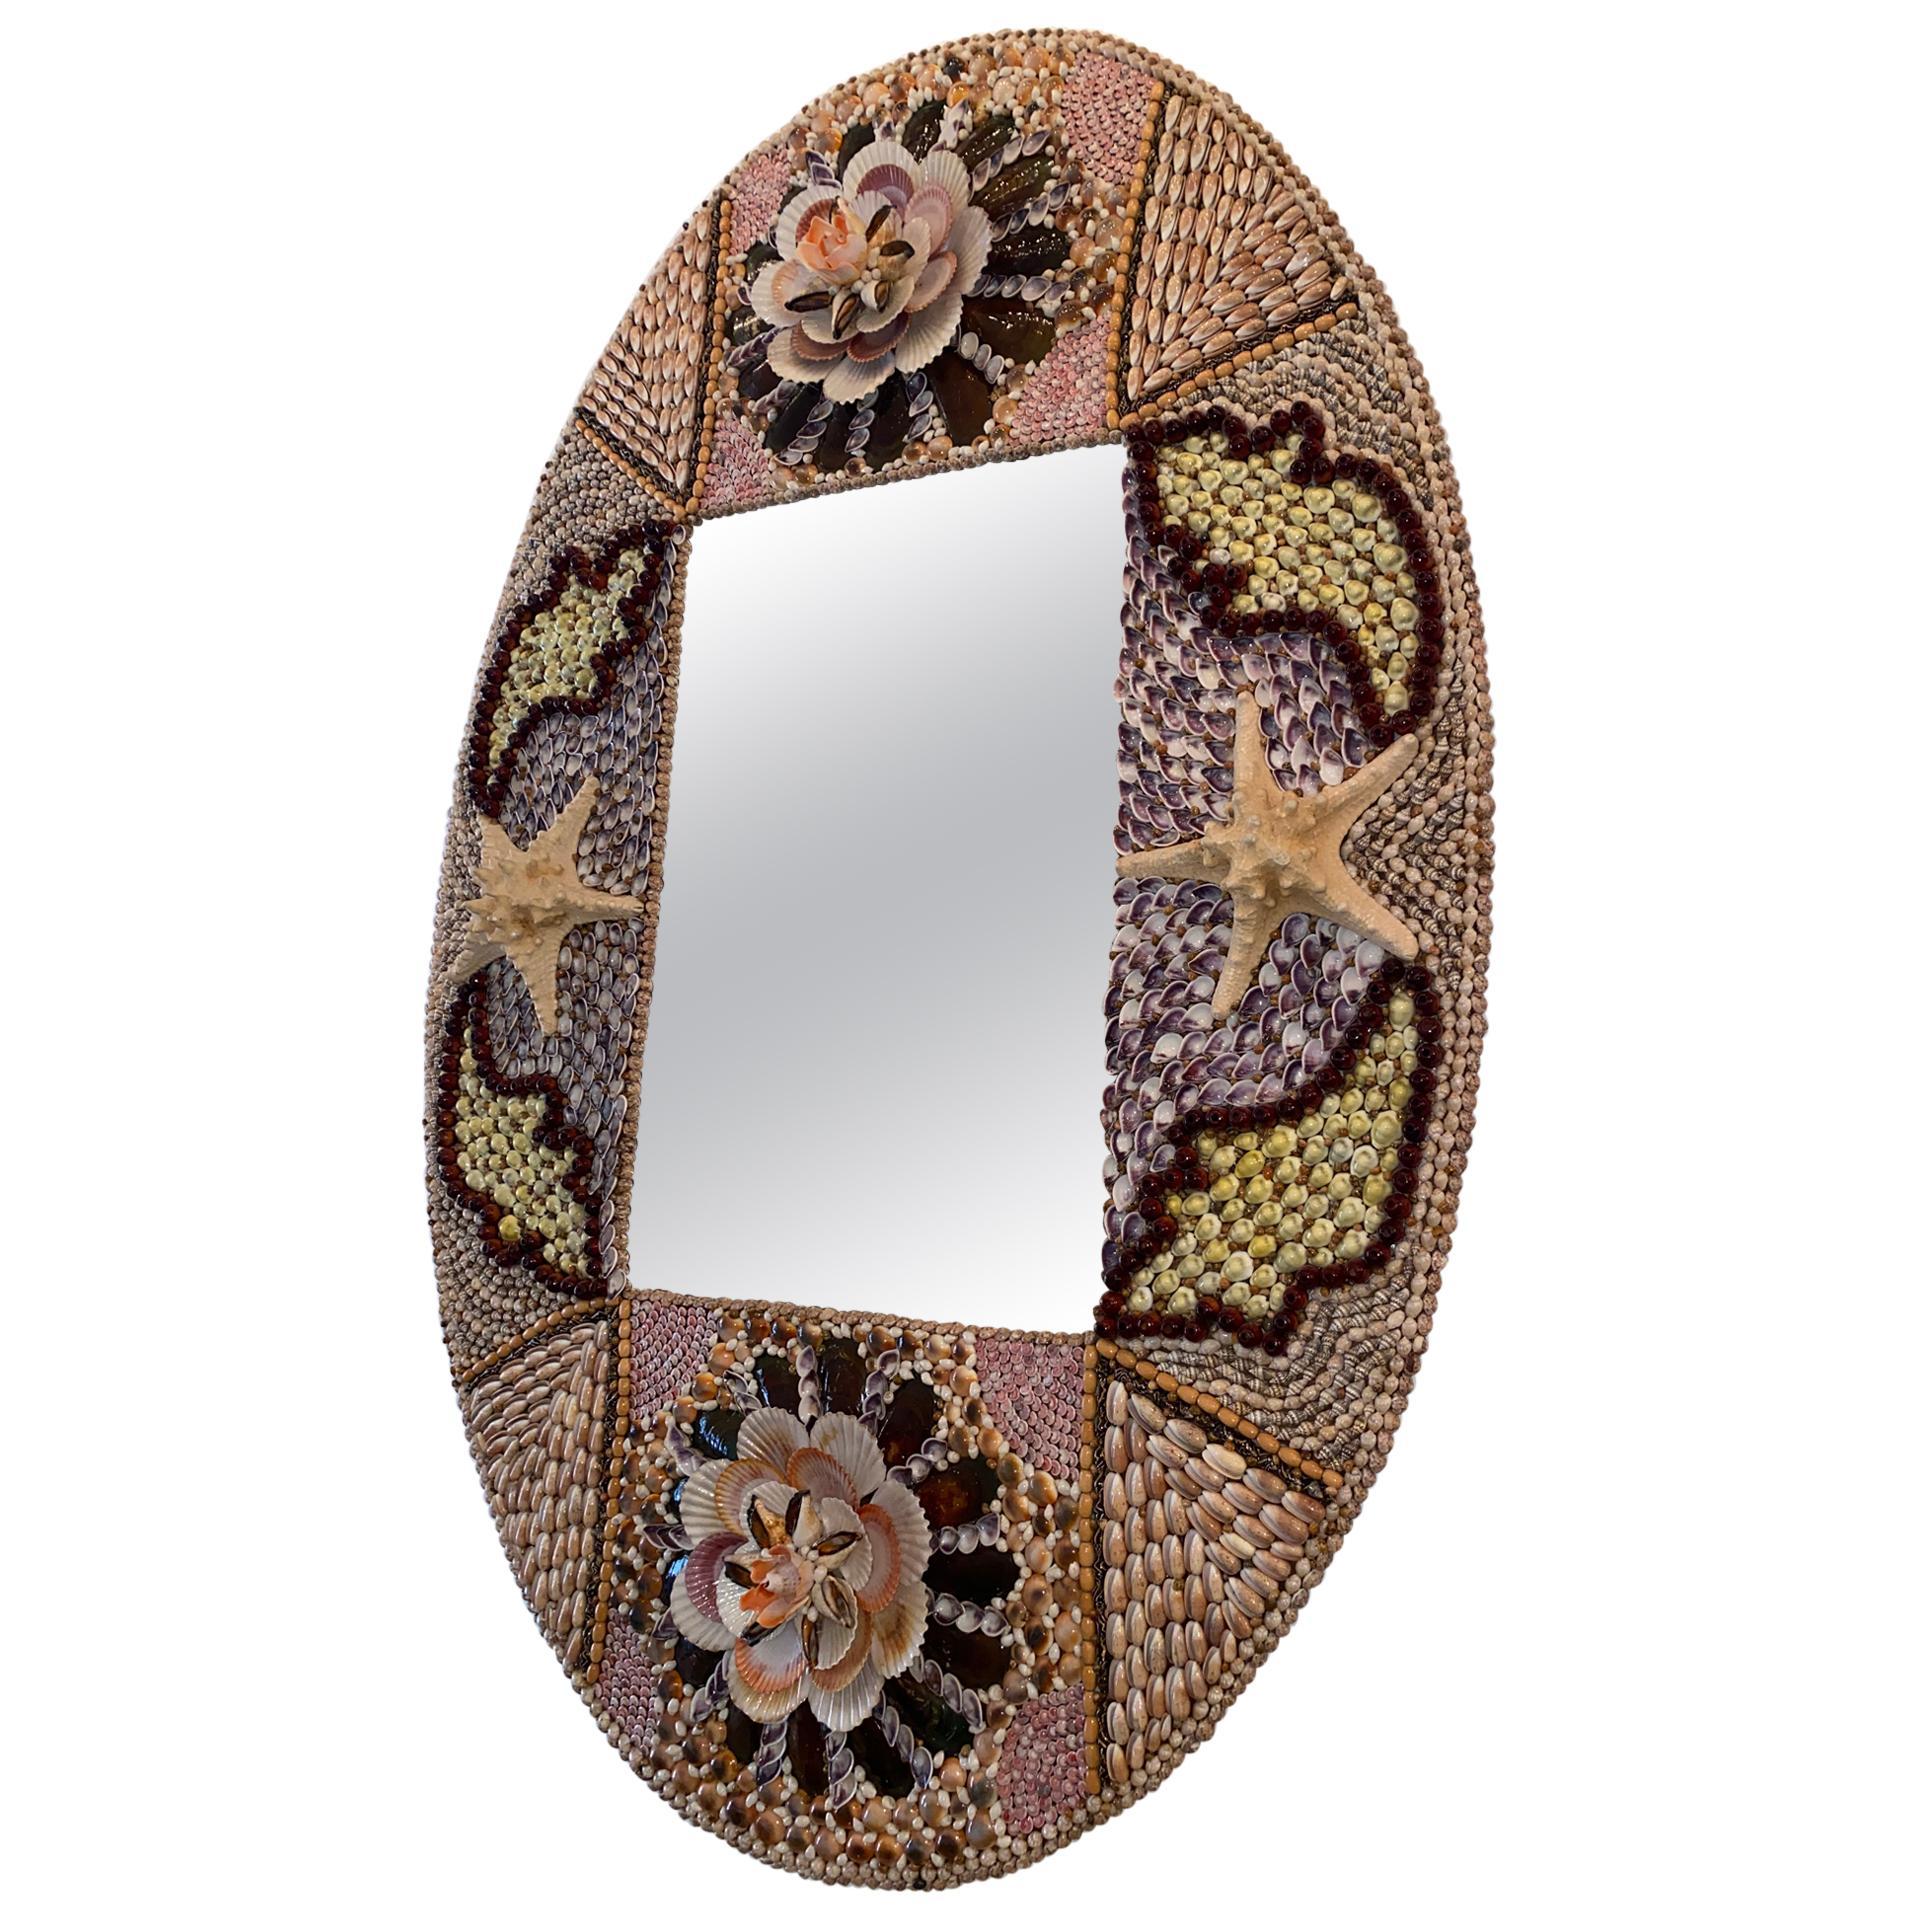 Oval Seashell Encrusted Wall Mirror